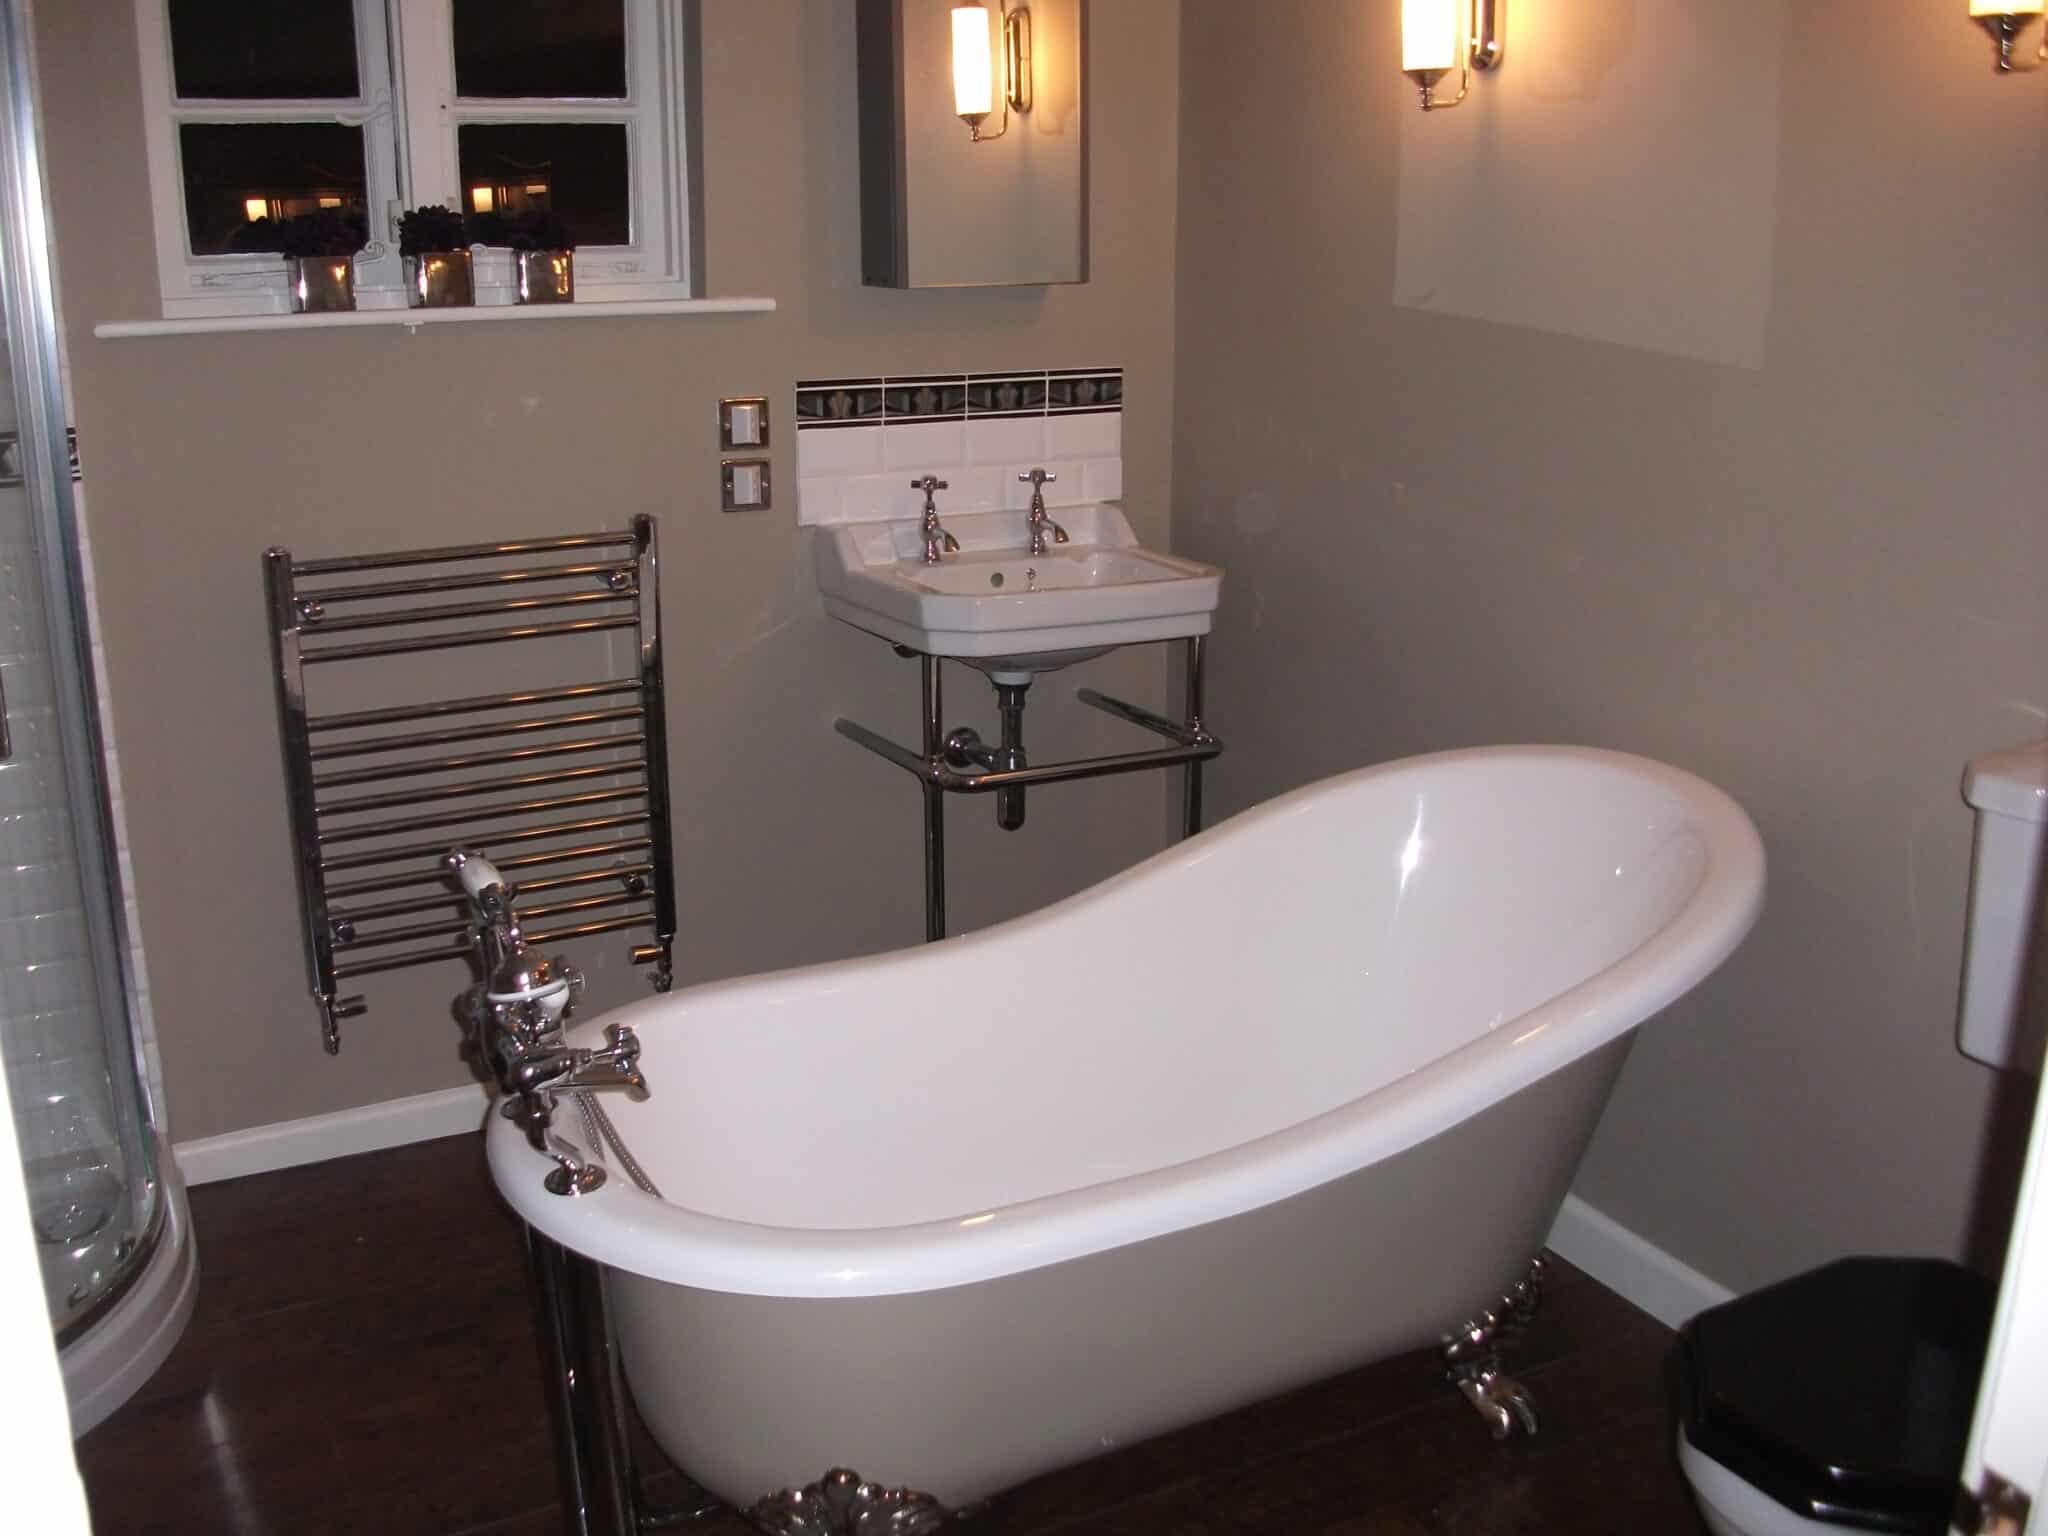 Bathroom redesign, slipper bath, Brampton near Huntingdon 1